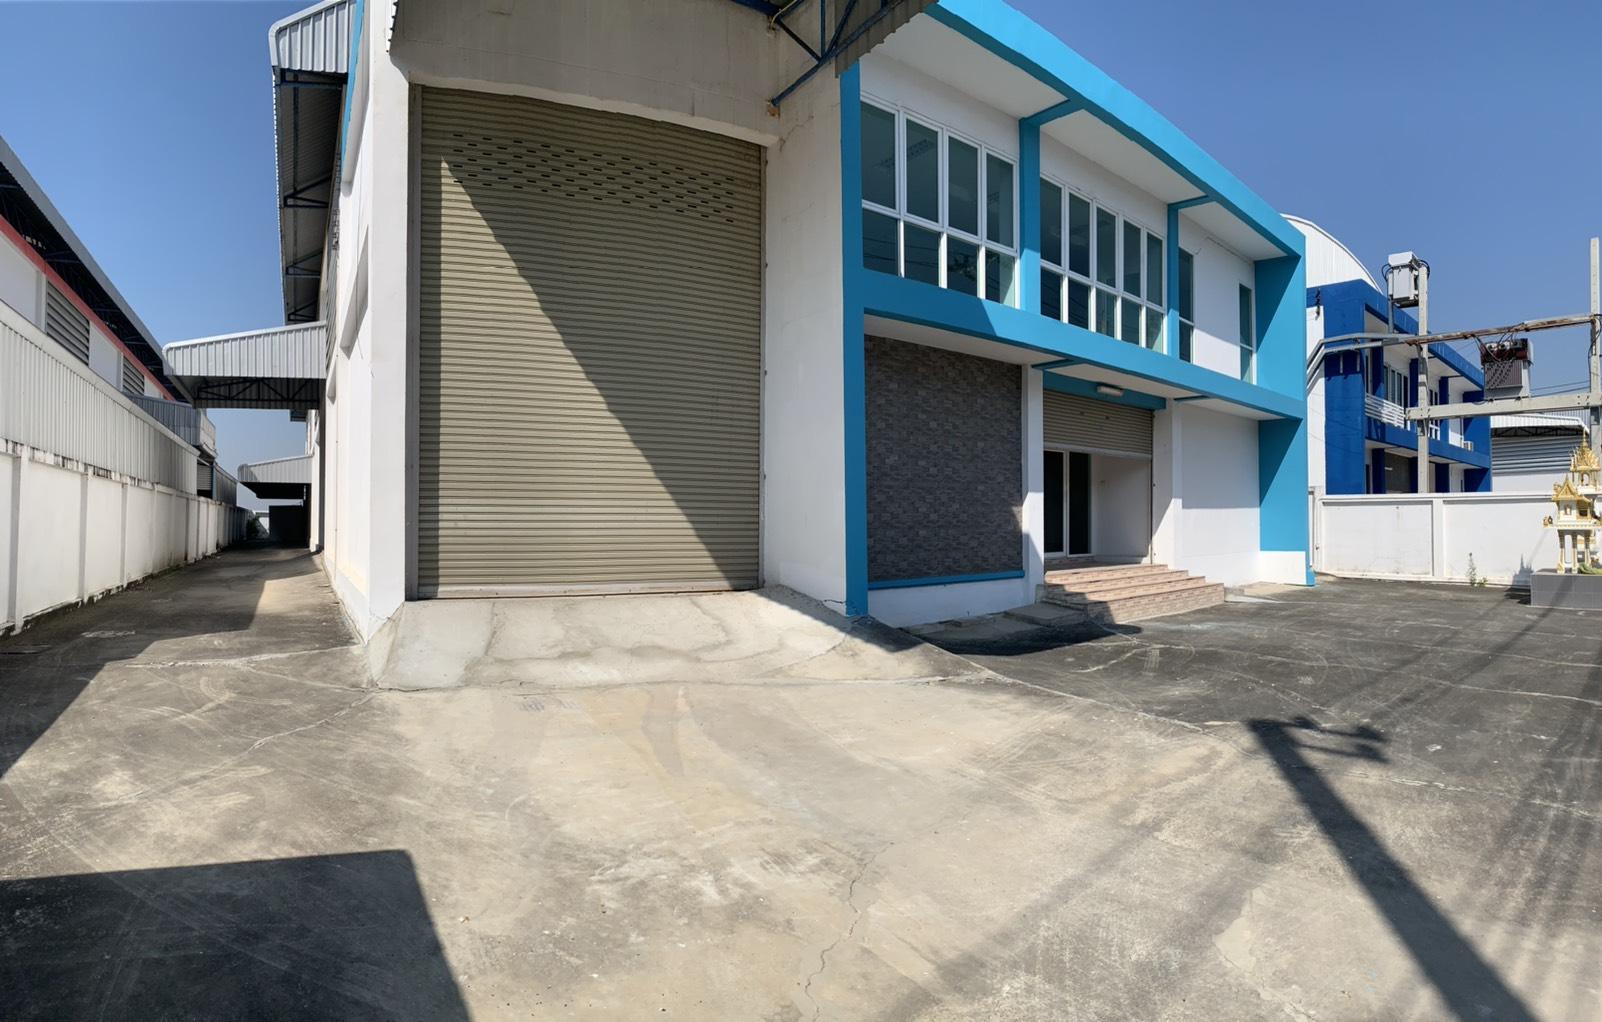 Warehouse Romklao Rd., Khlongsongtonnun Sub-District, Lad Krabang